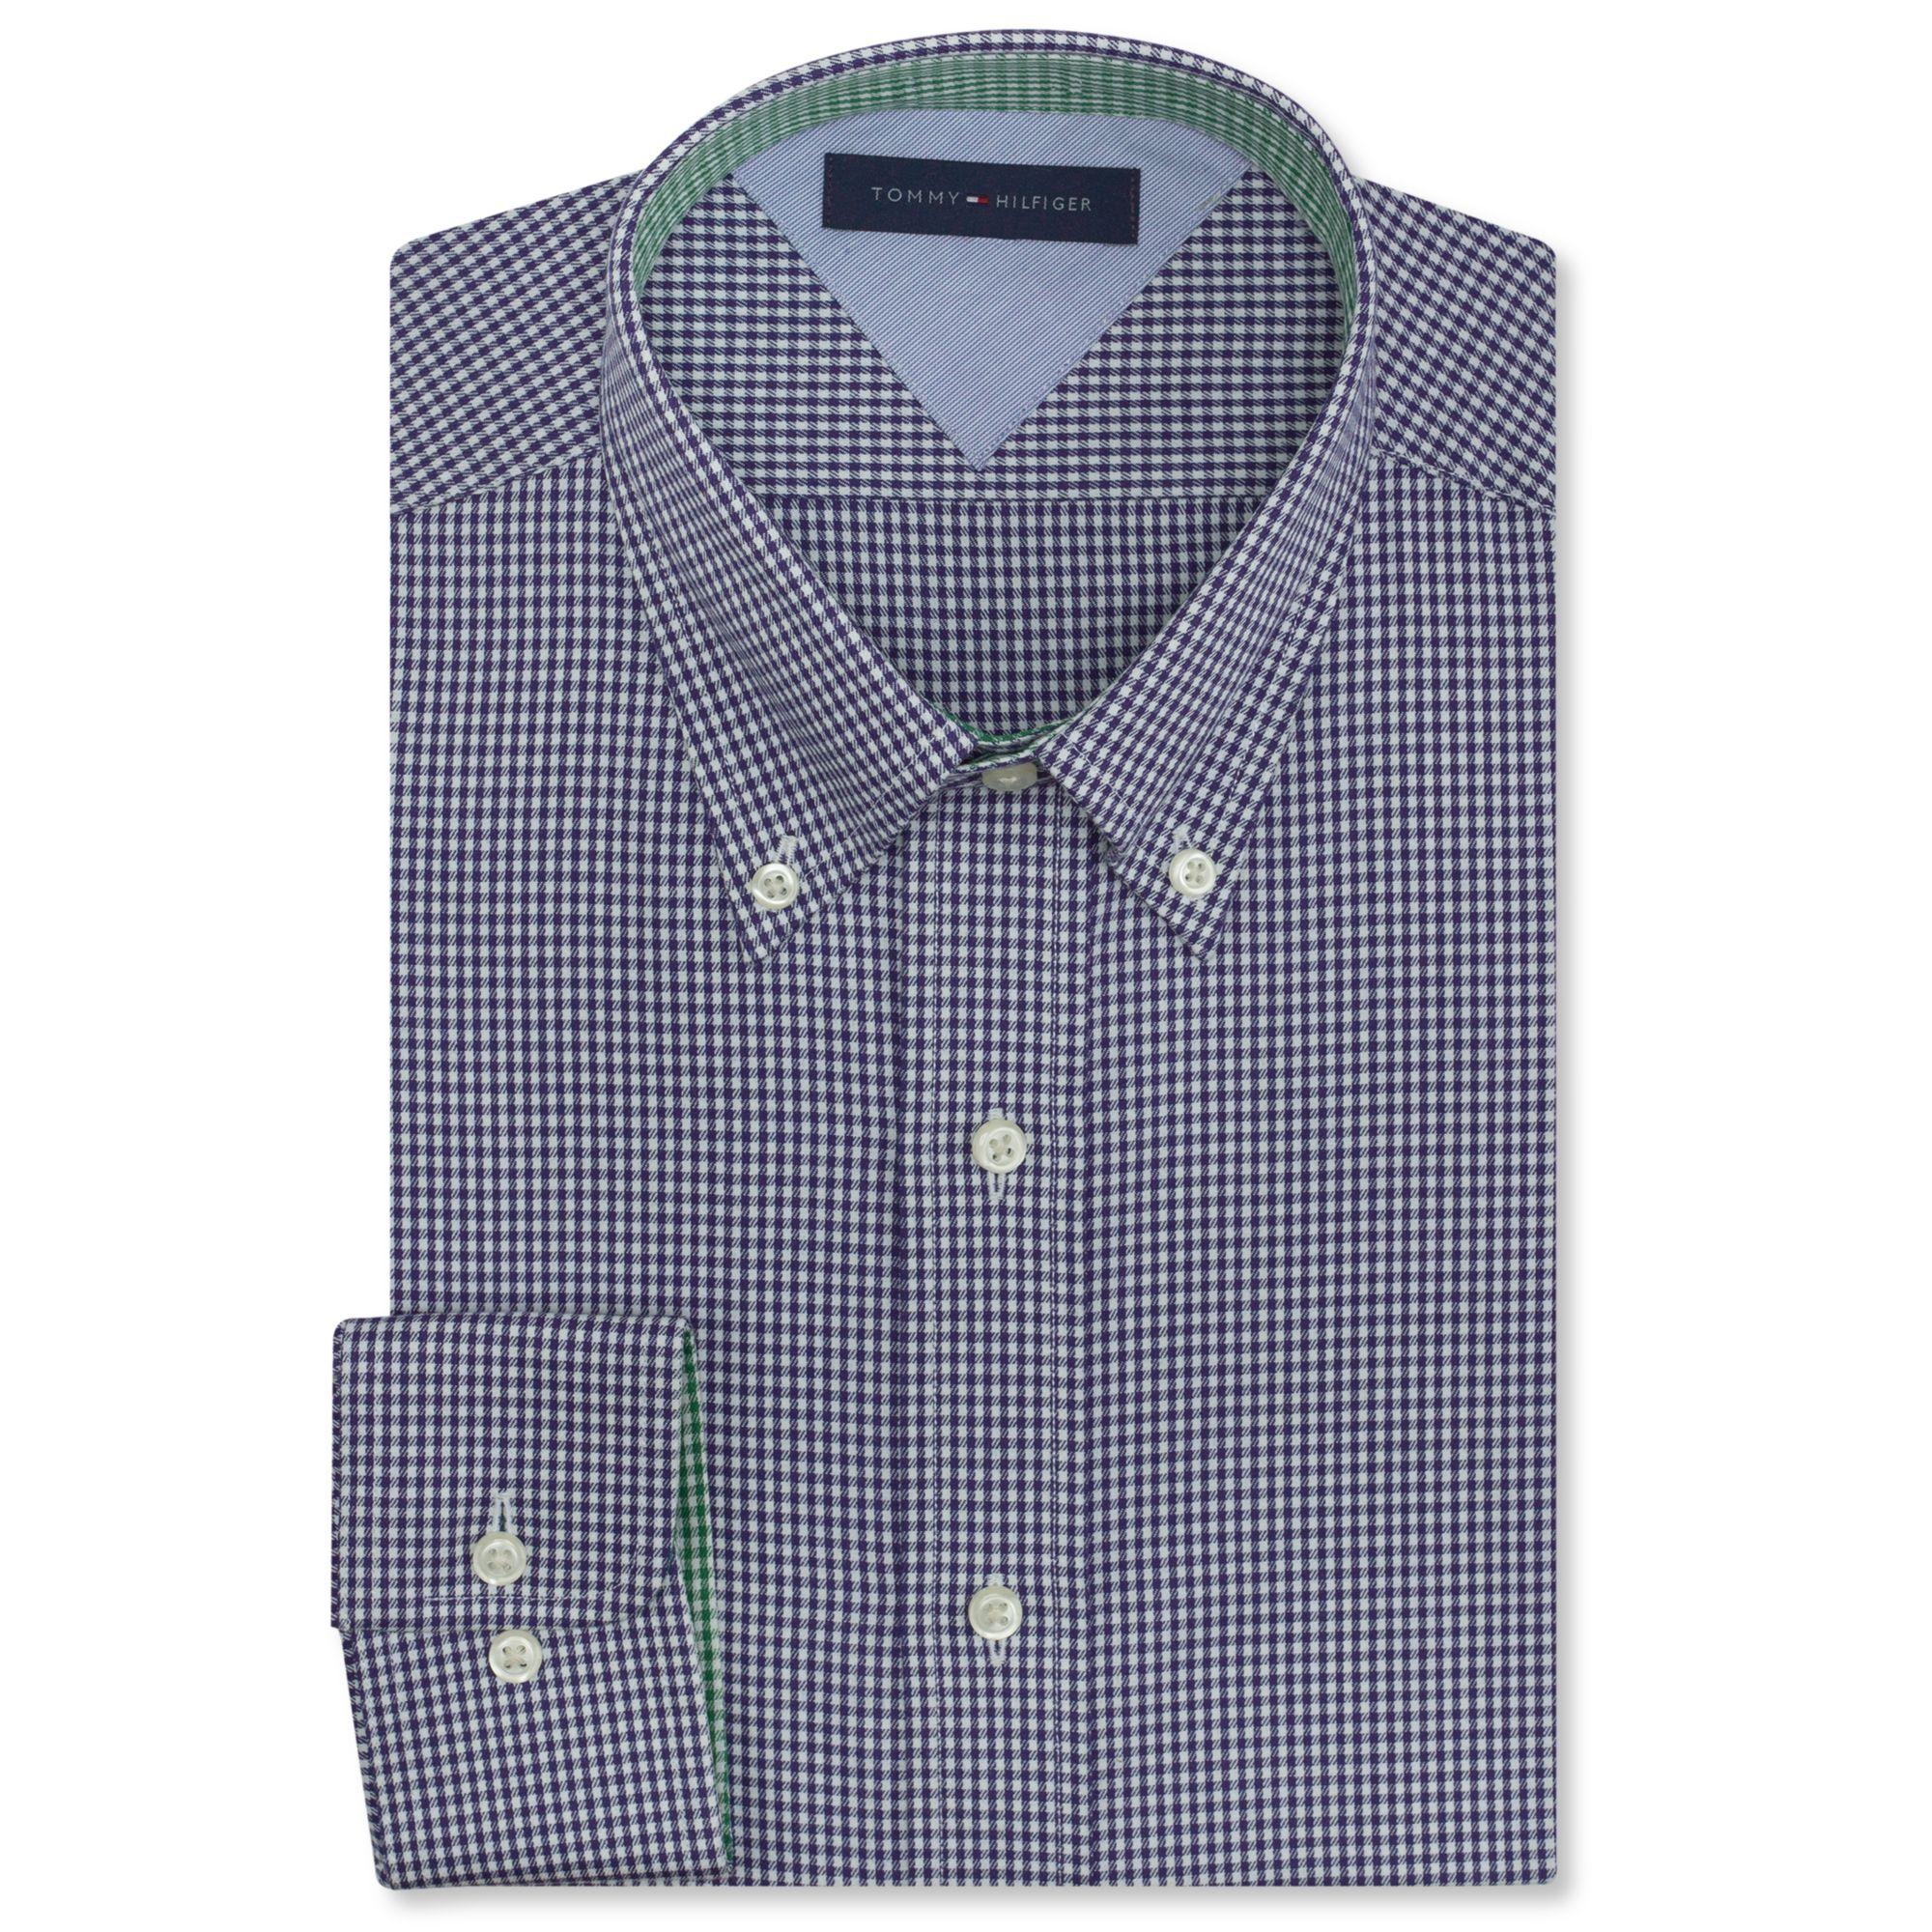 Tommy hilfiger big and tall blue gingham dress shirt in for Tommy hilfiger gingham dress shirt